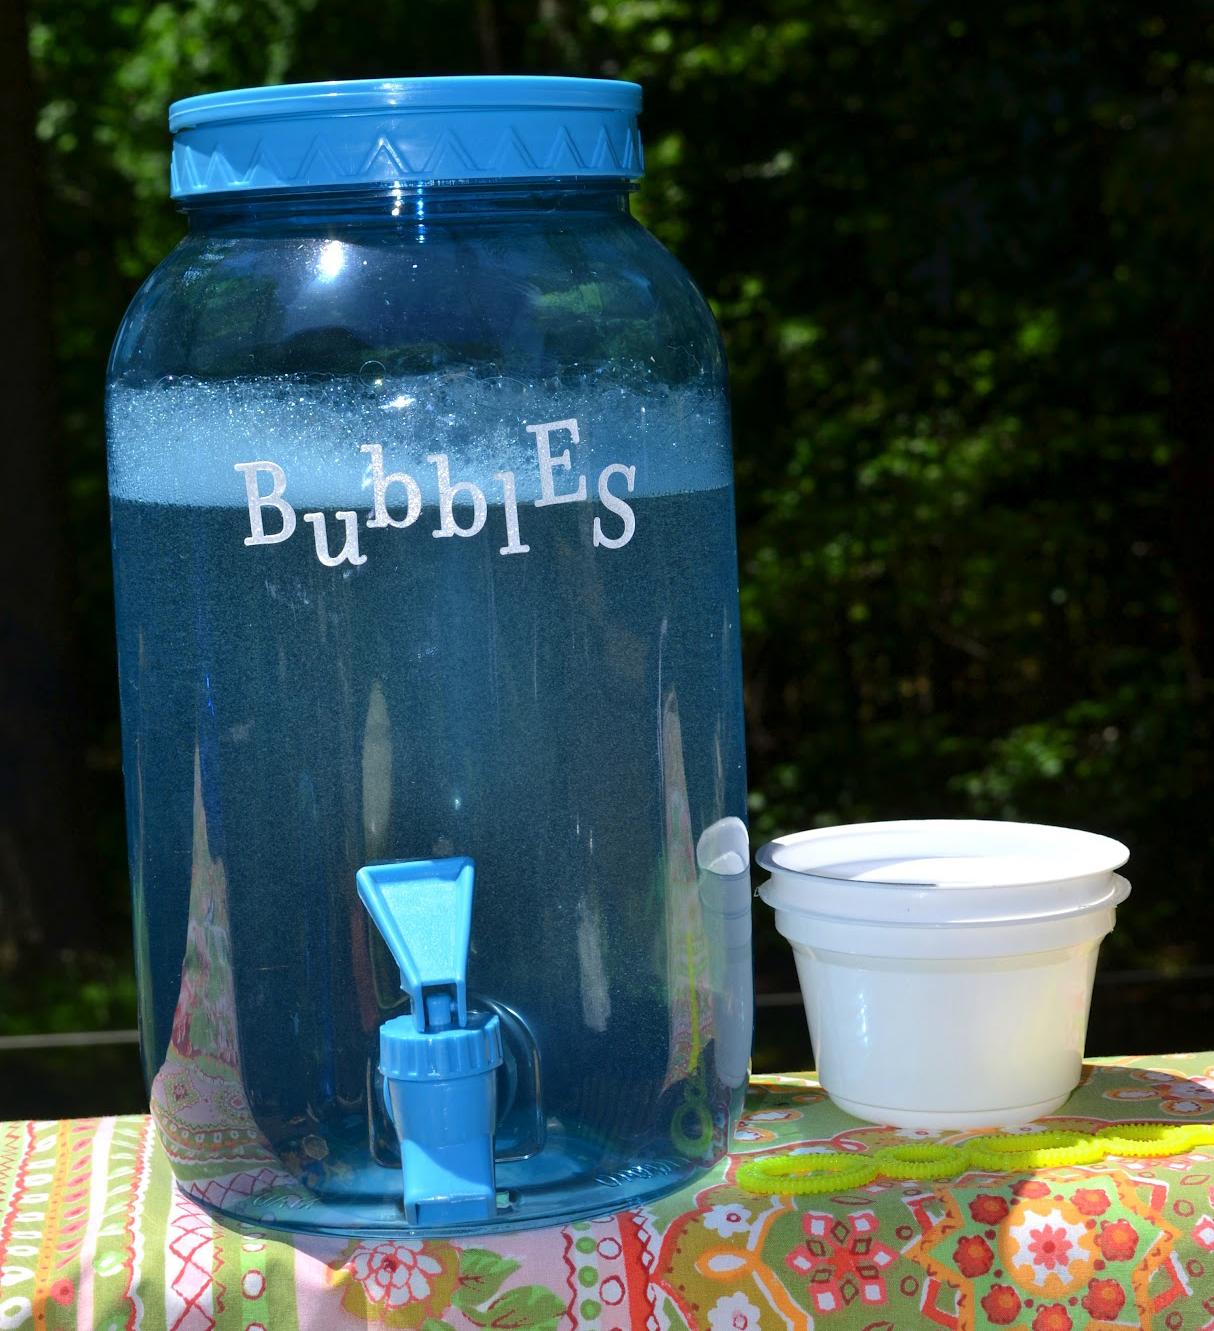 Set Up a Bubble Station